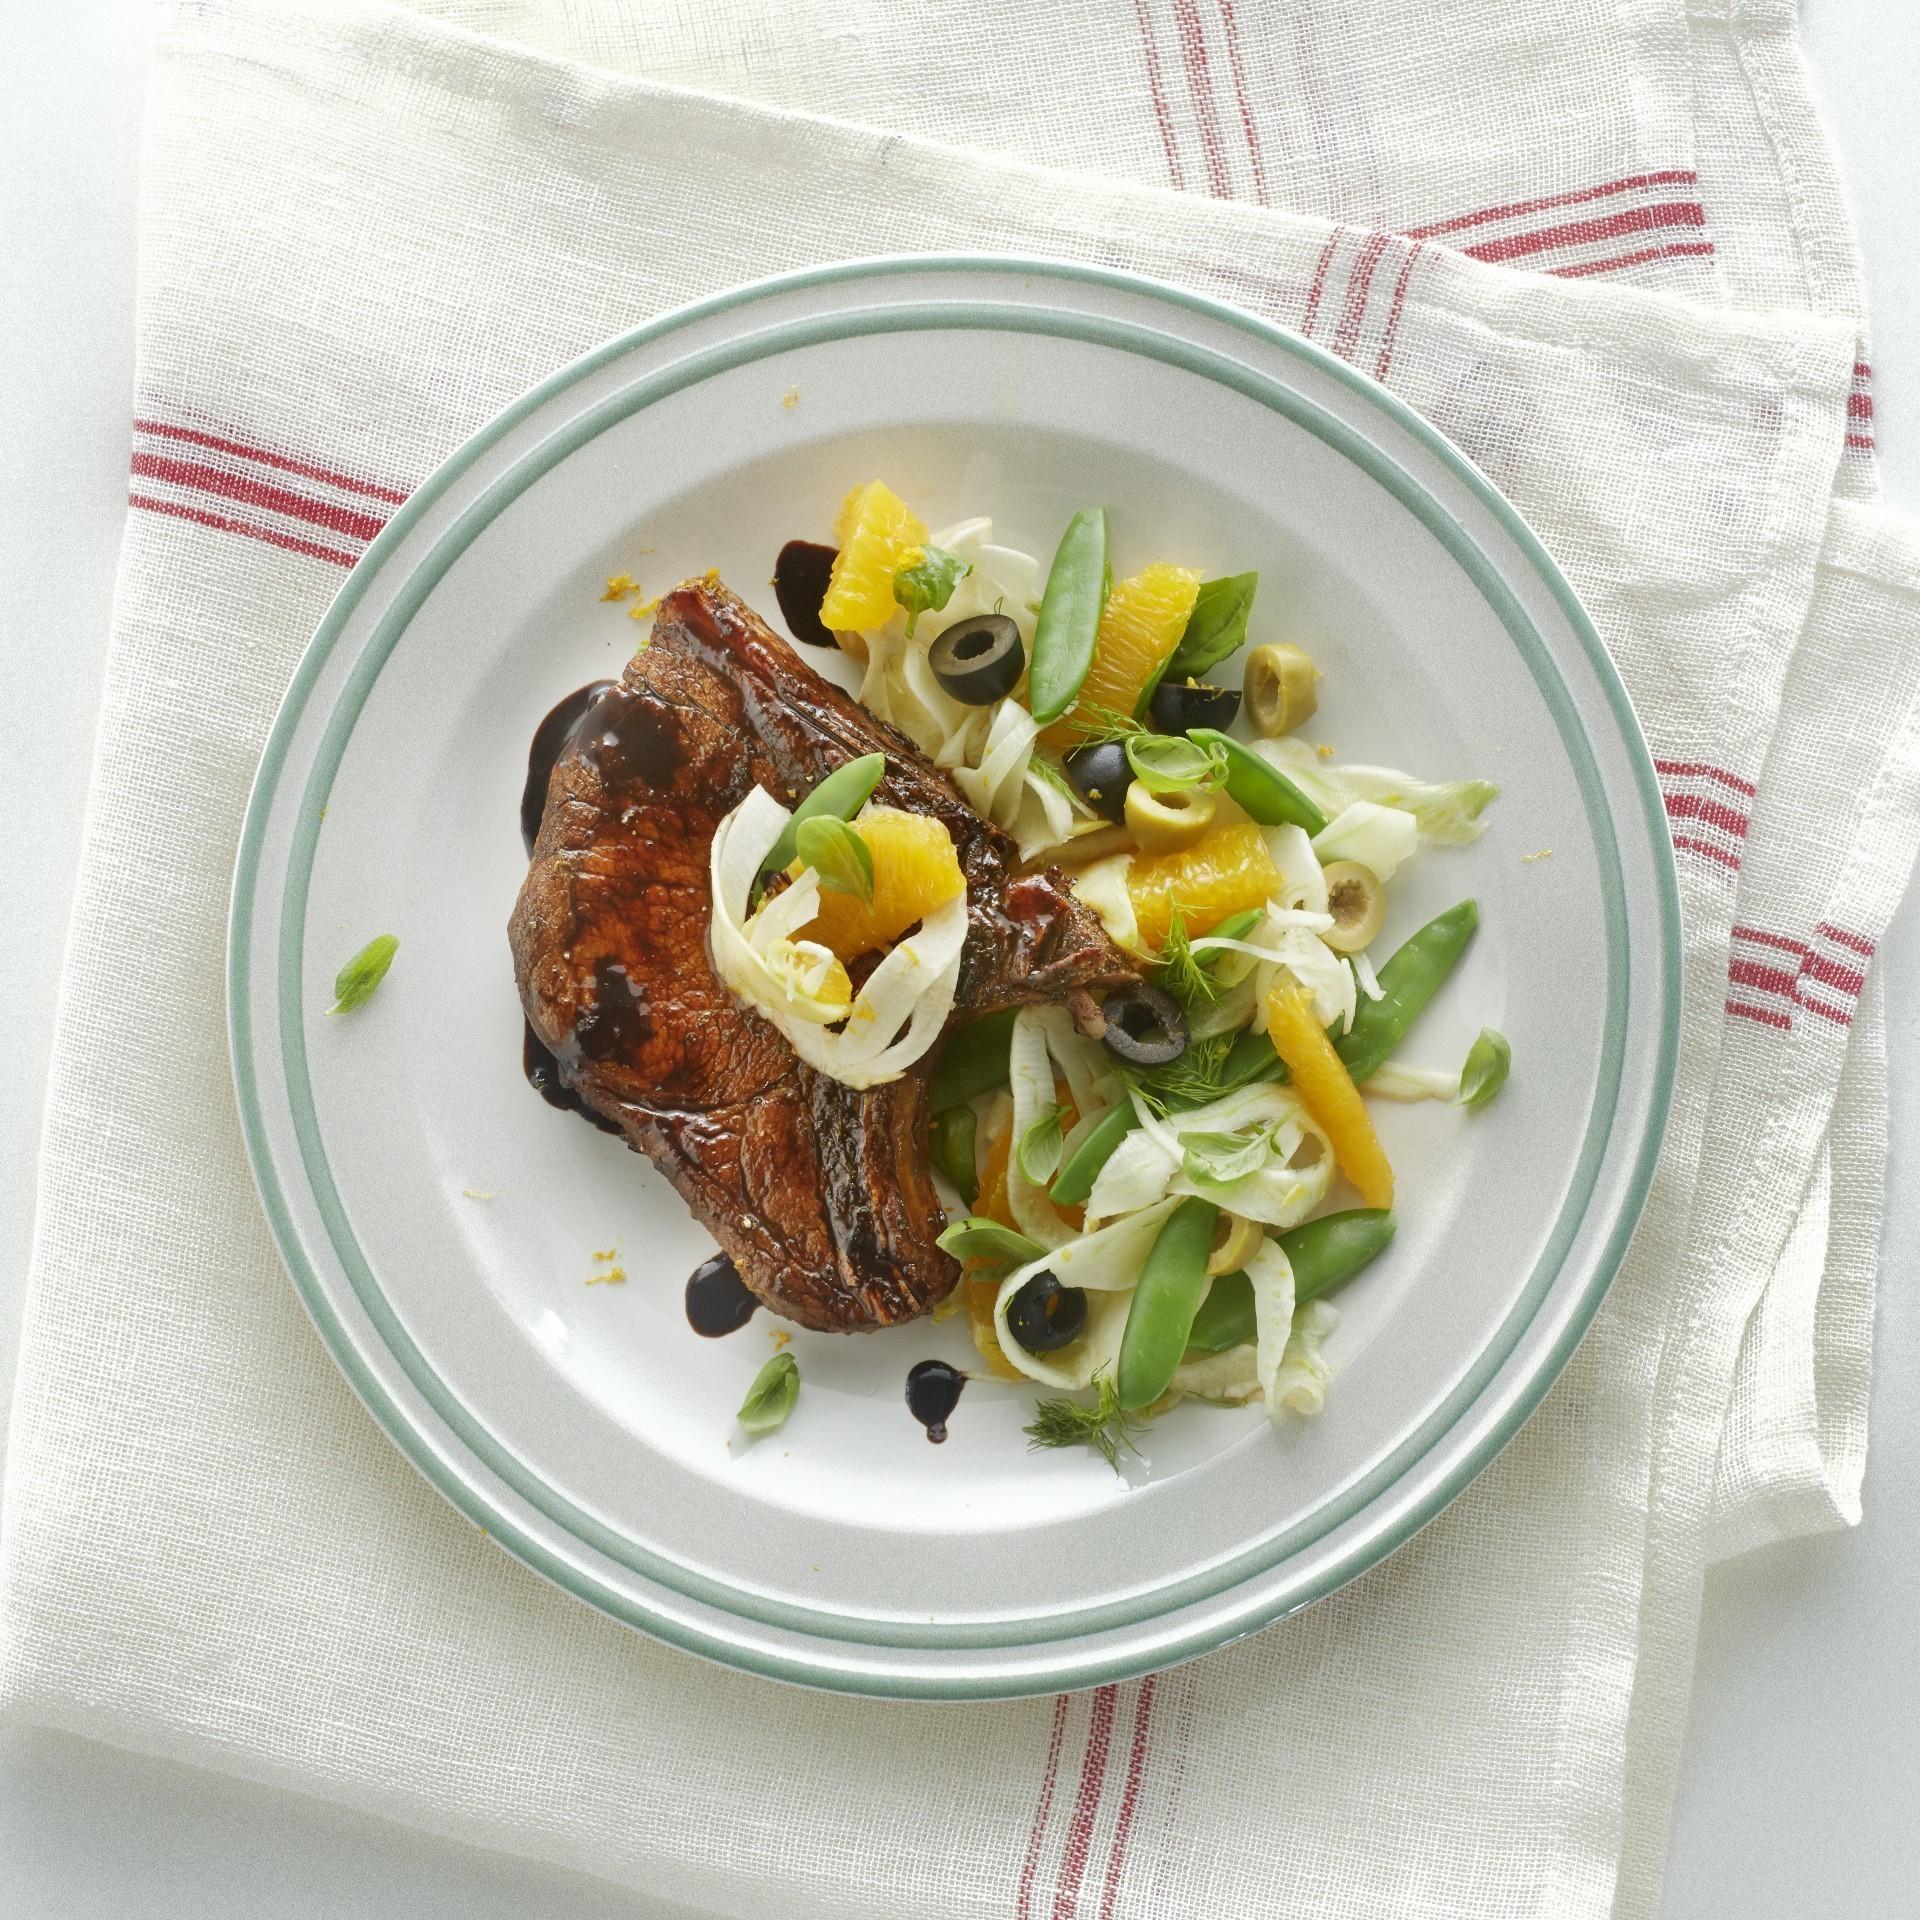 Rib chop in balsamic vinegar